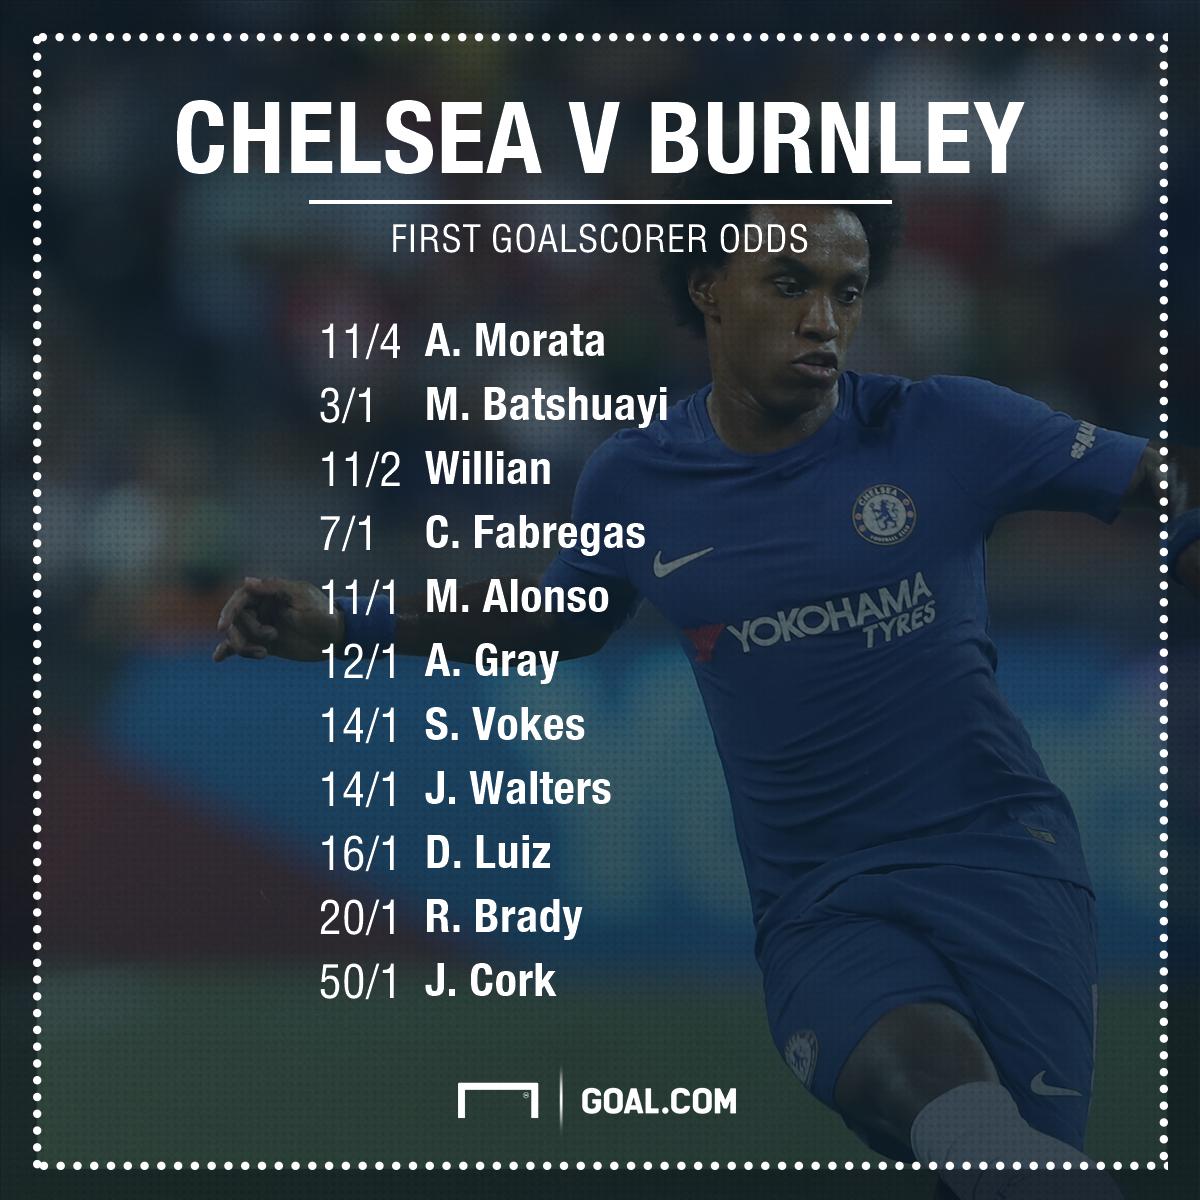 Chelsea odds versus Burnley